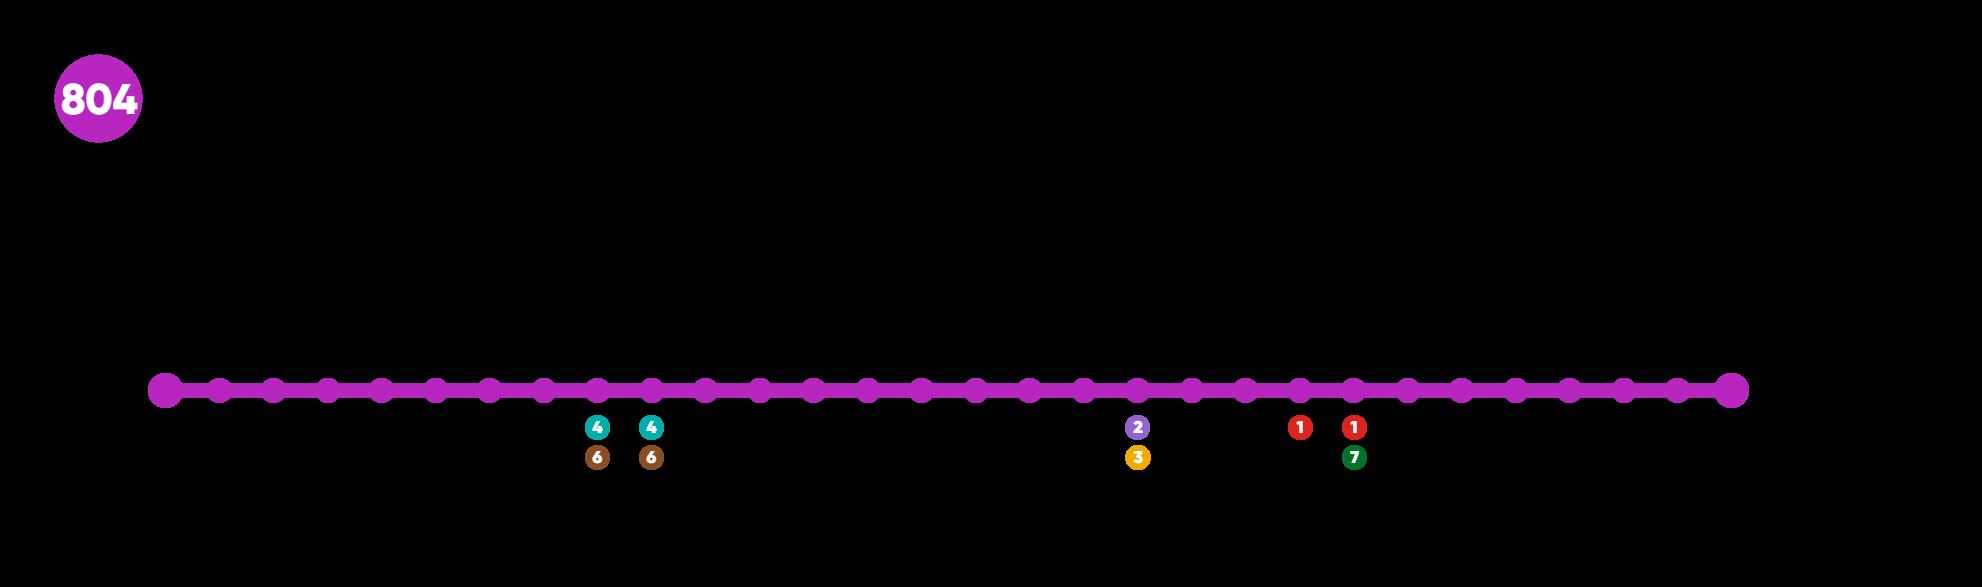 [Image: N2_L804_trans1.png]